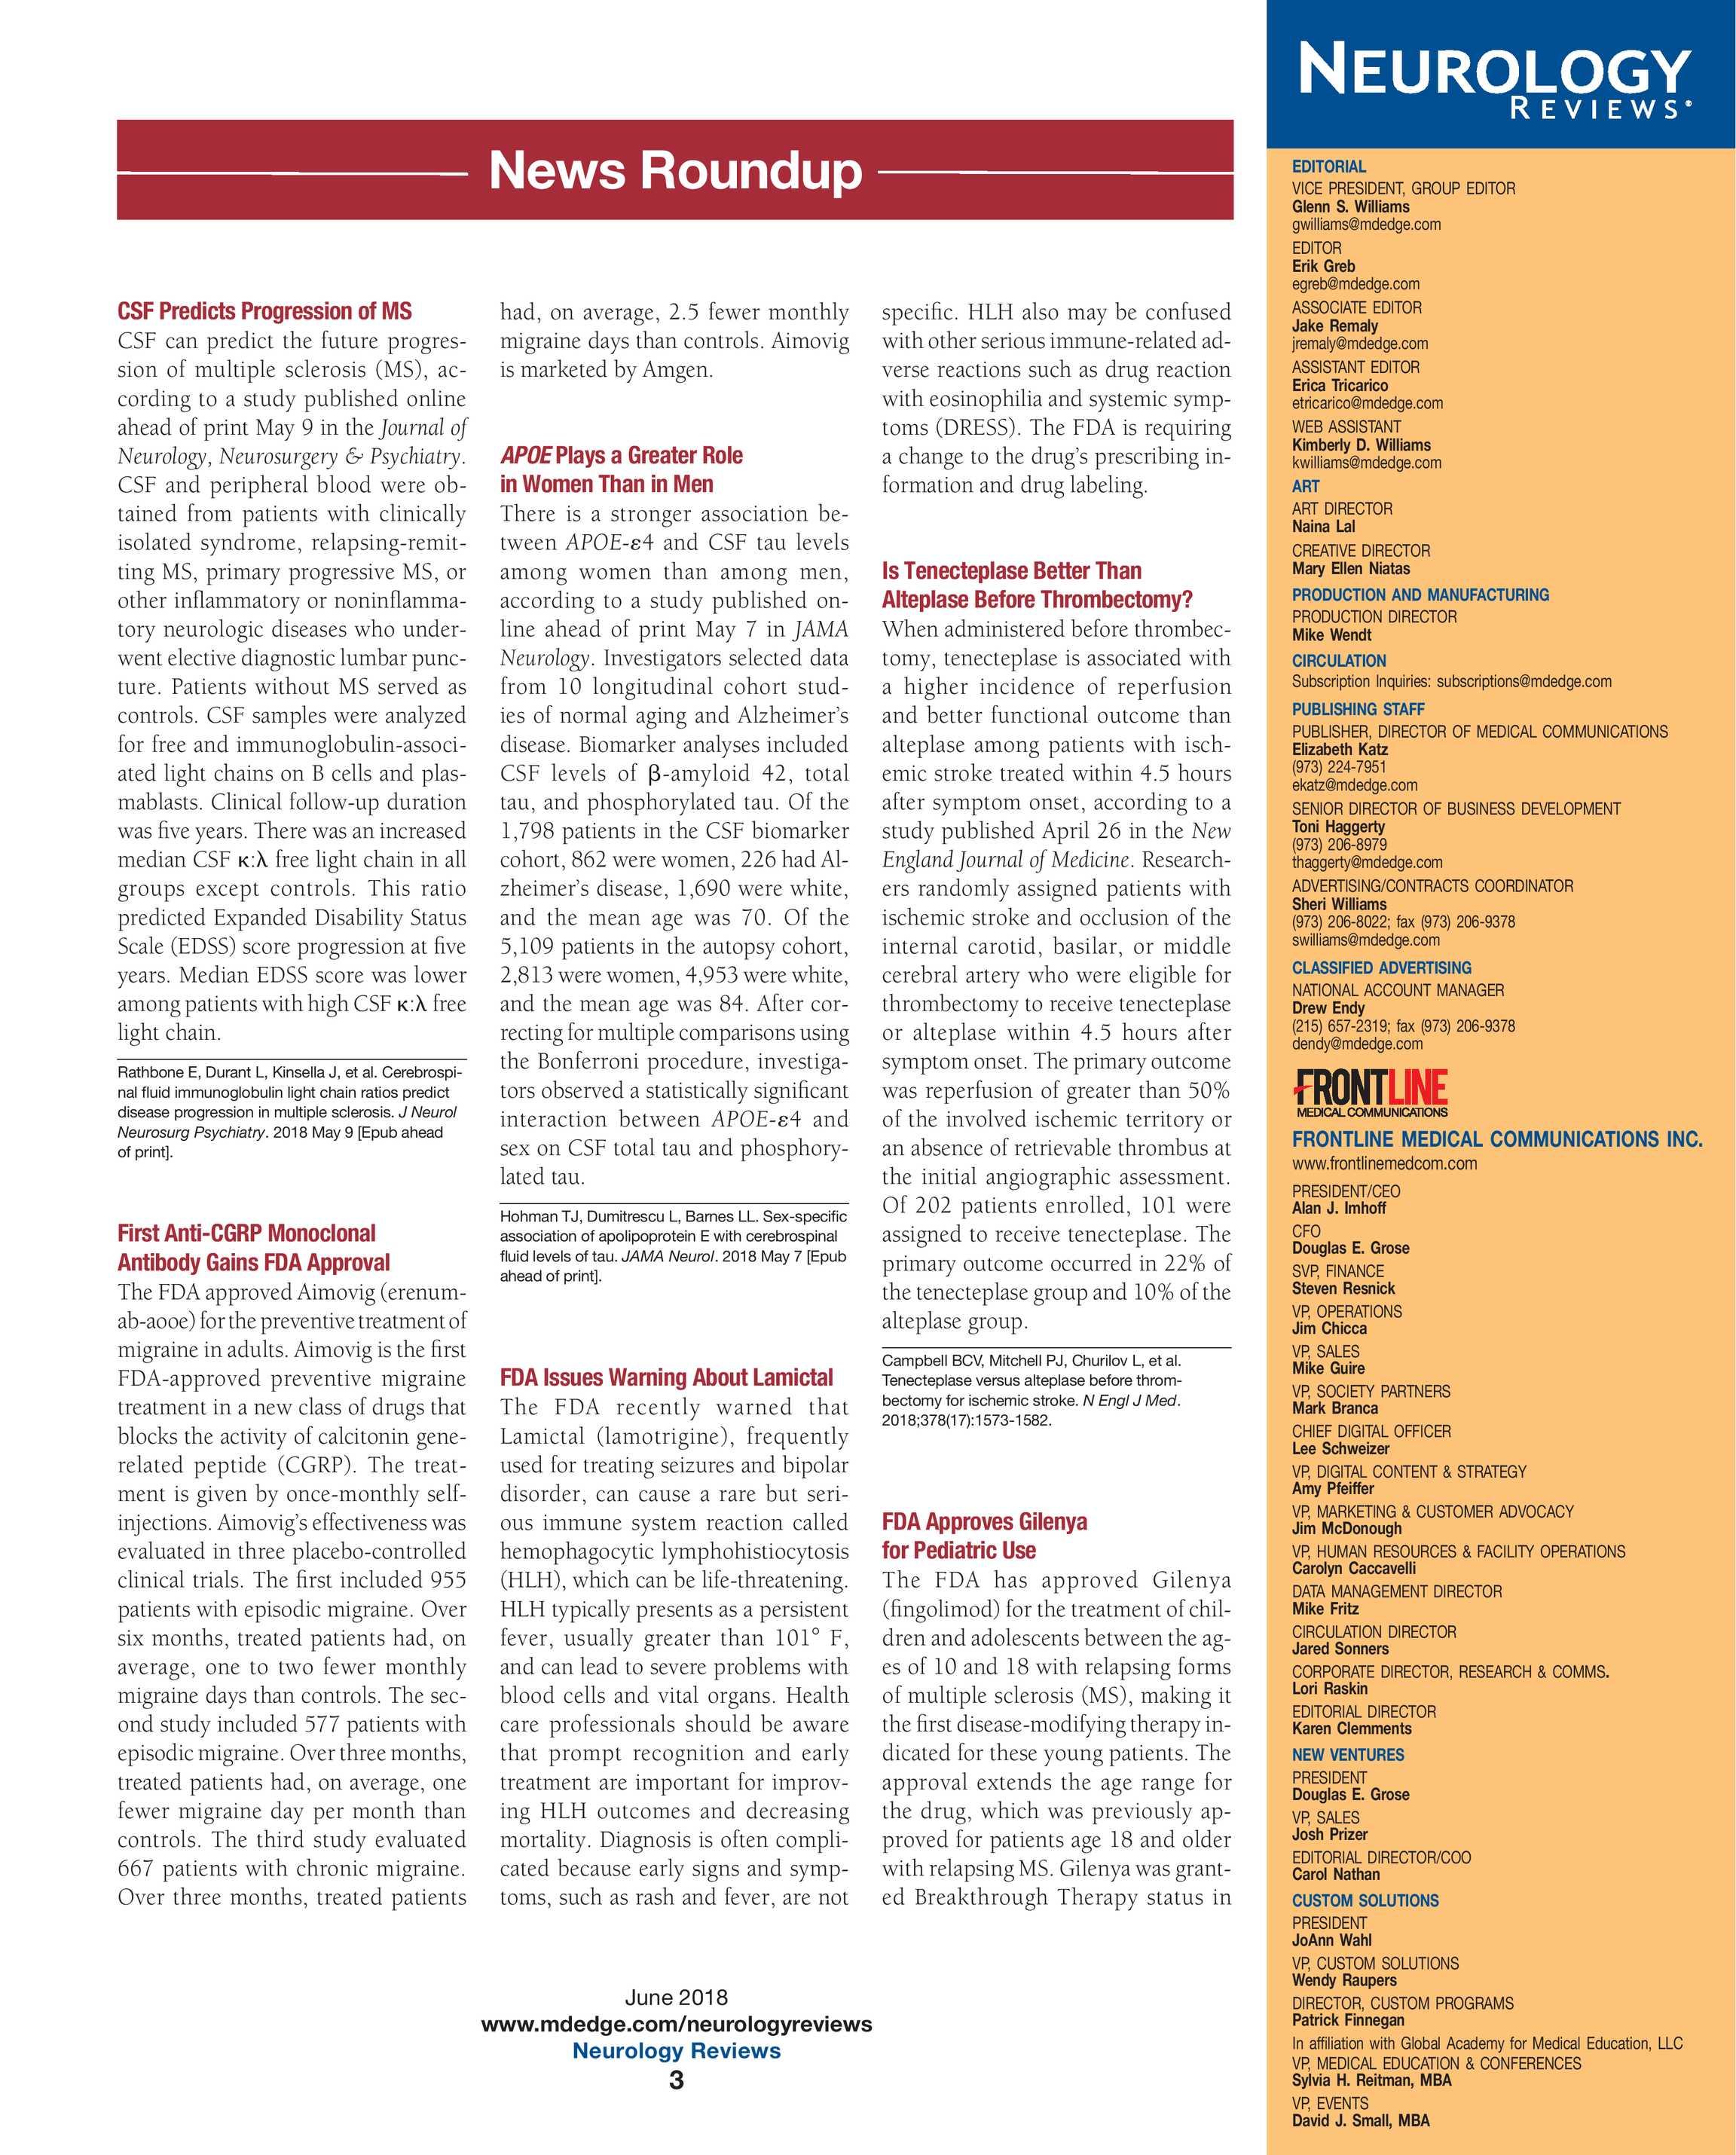 Gilenya Reviews Gilenya Reviews new pics